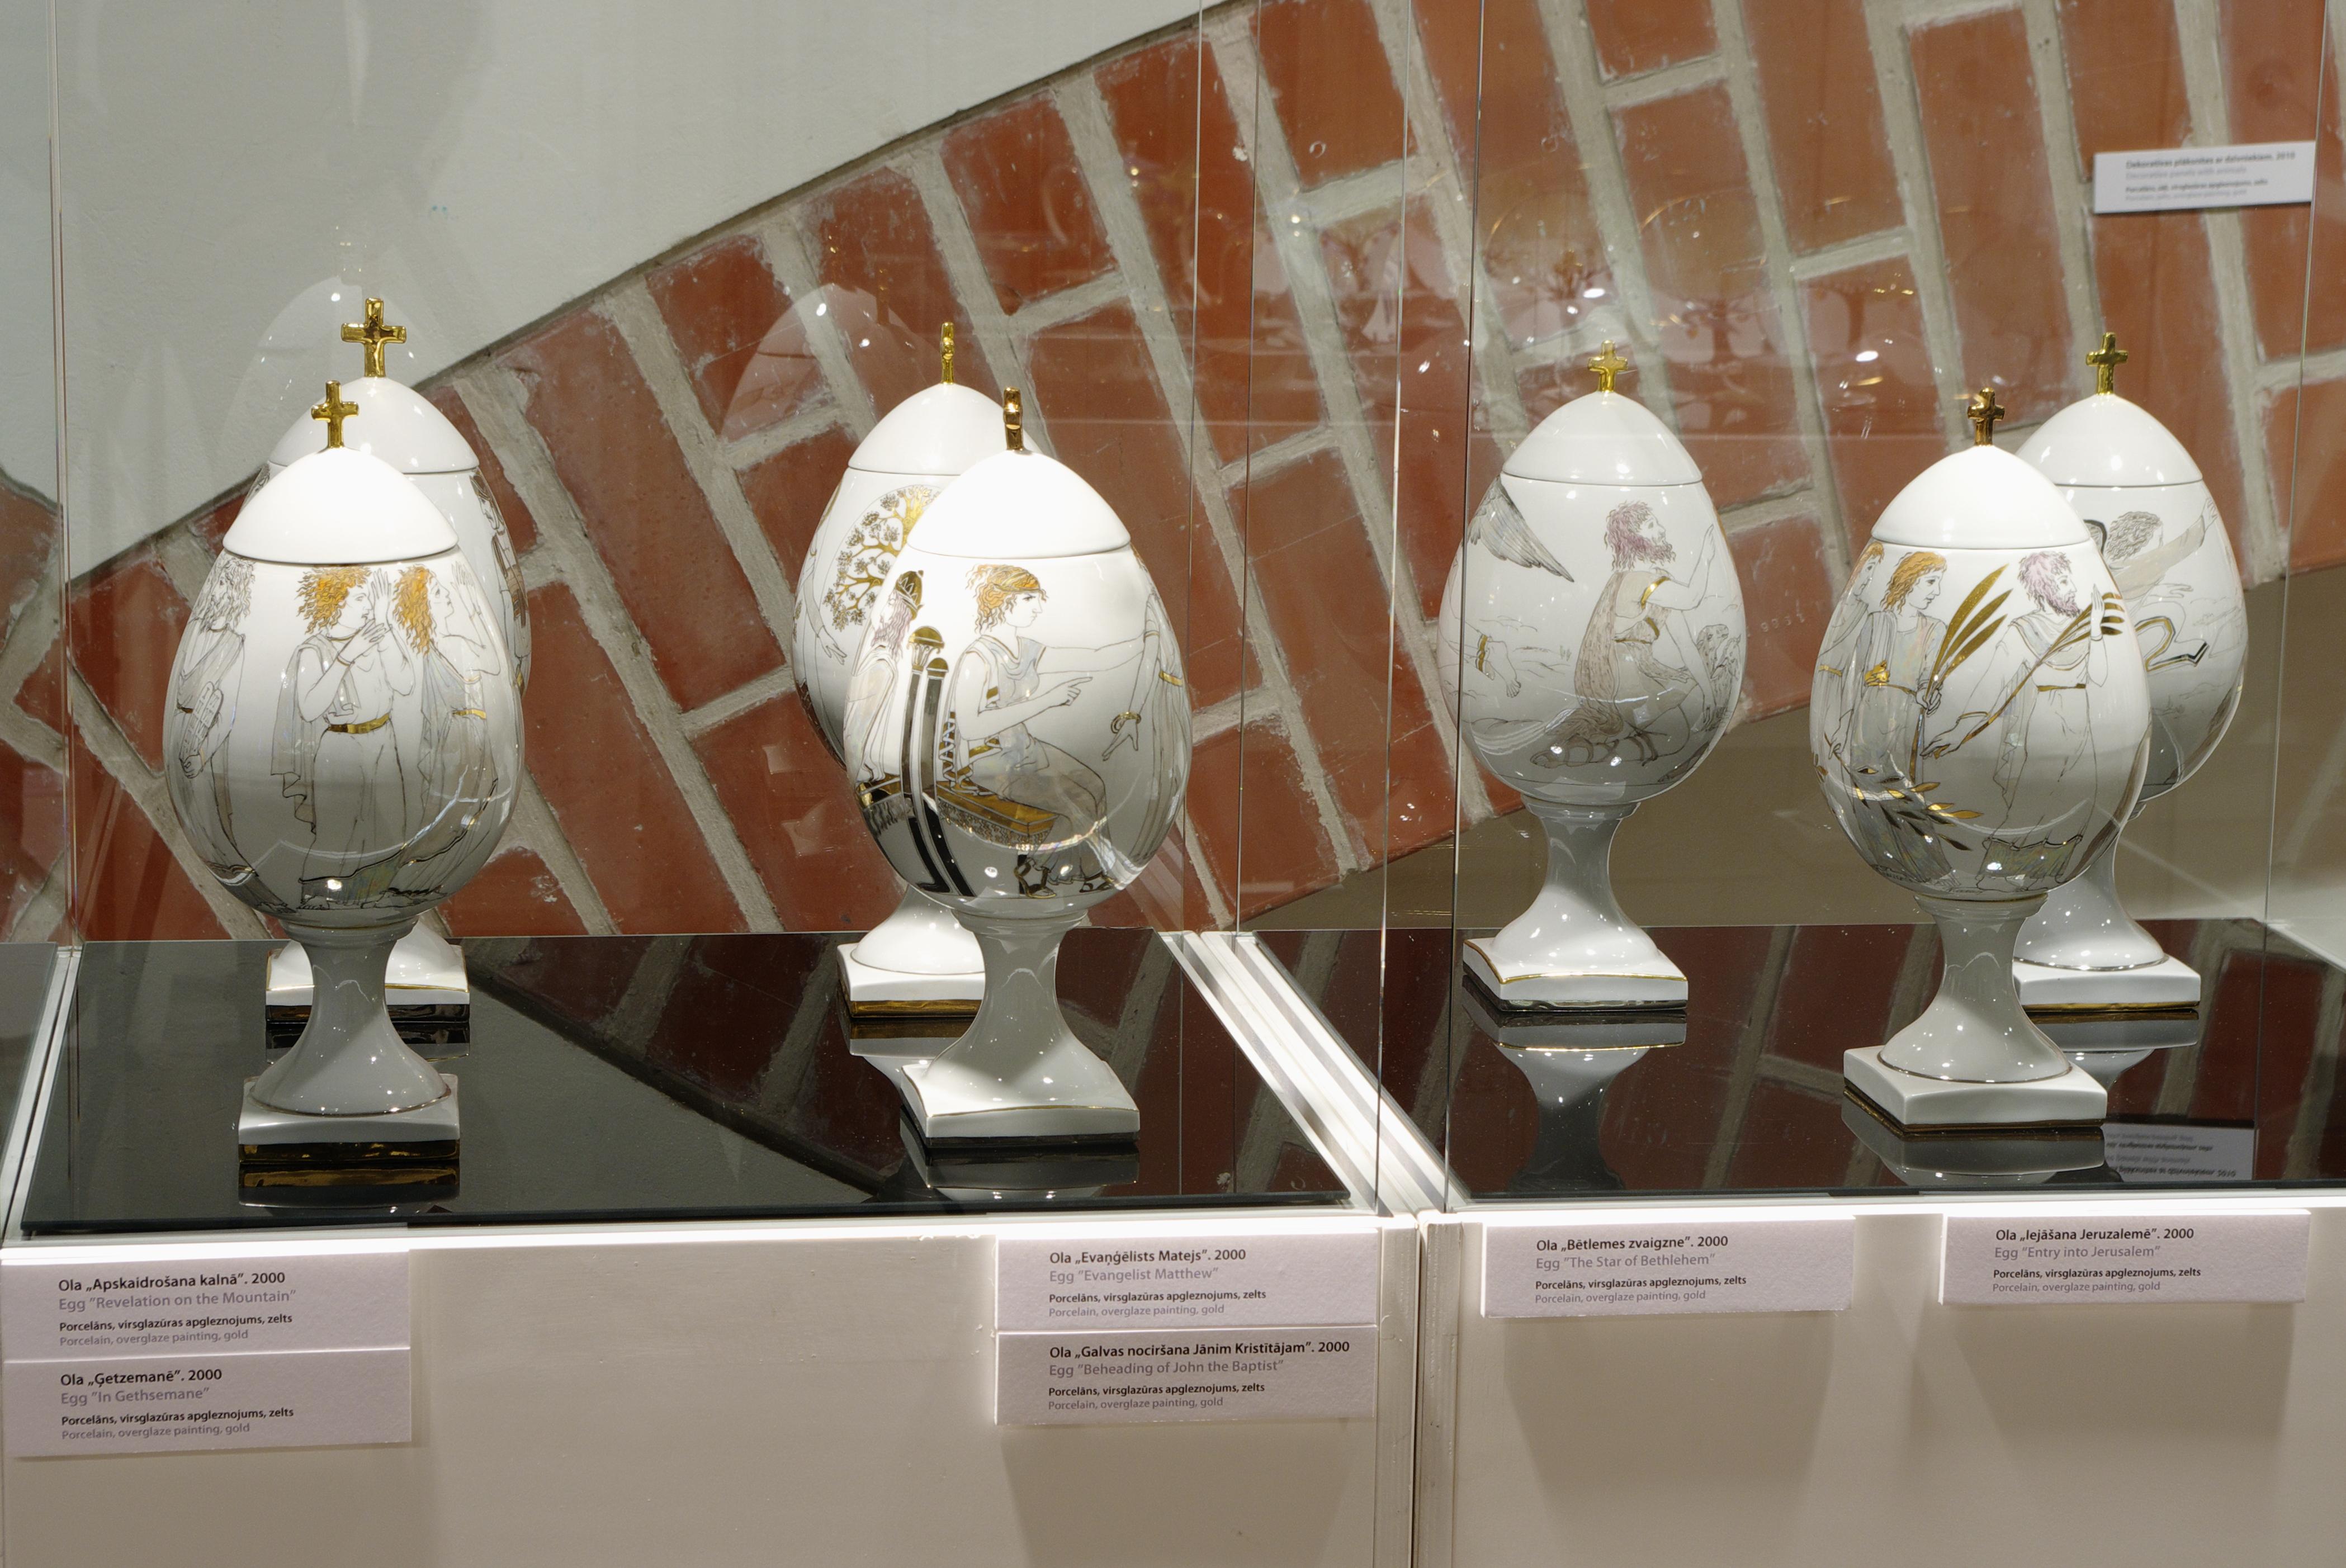 Antoņina Paškēviča, Antonina Pashkevich, Антонина Пашкевич. ART GALLERY PRESENTATION.